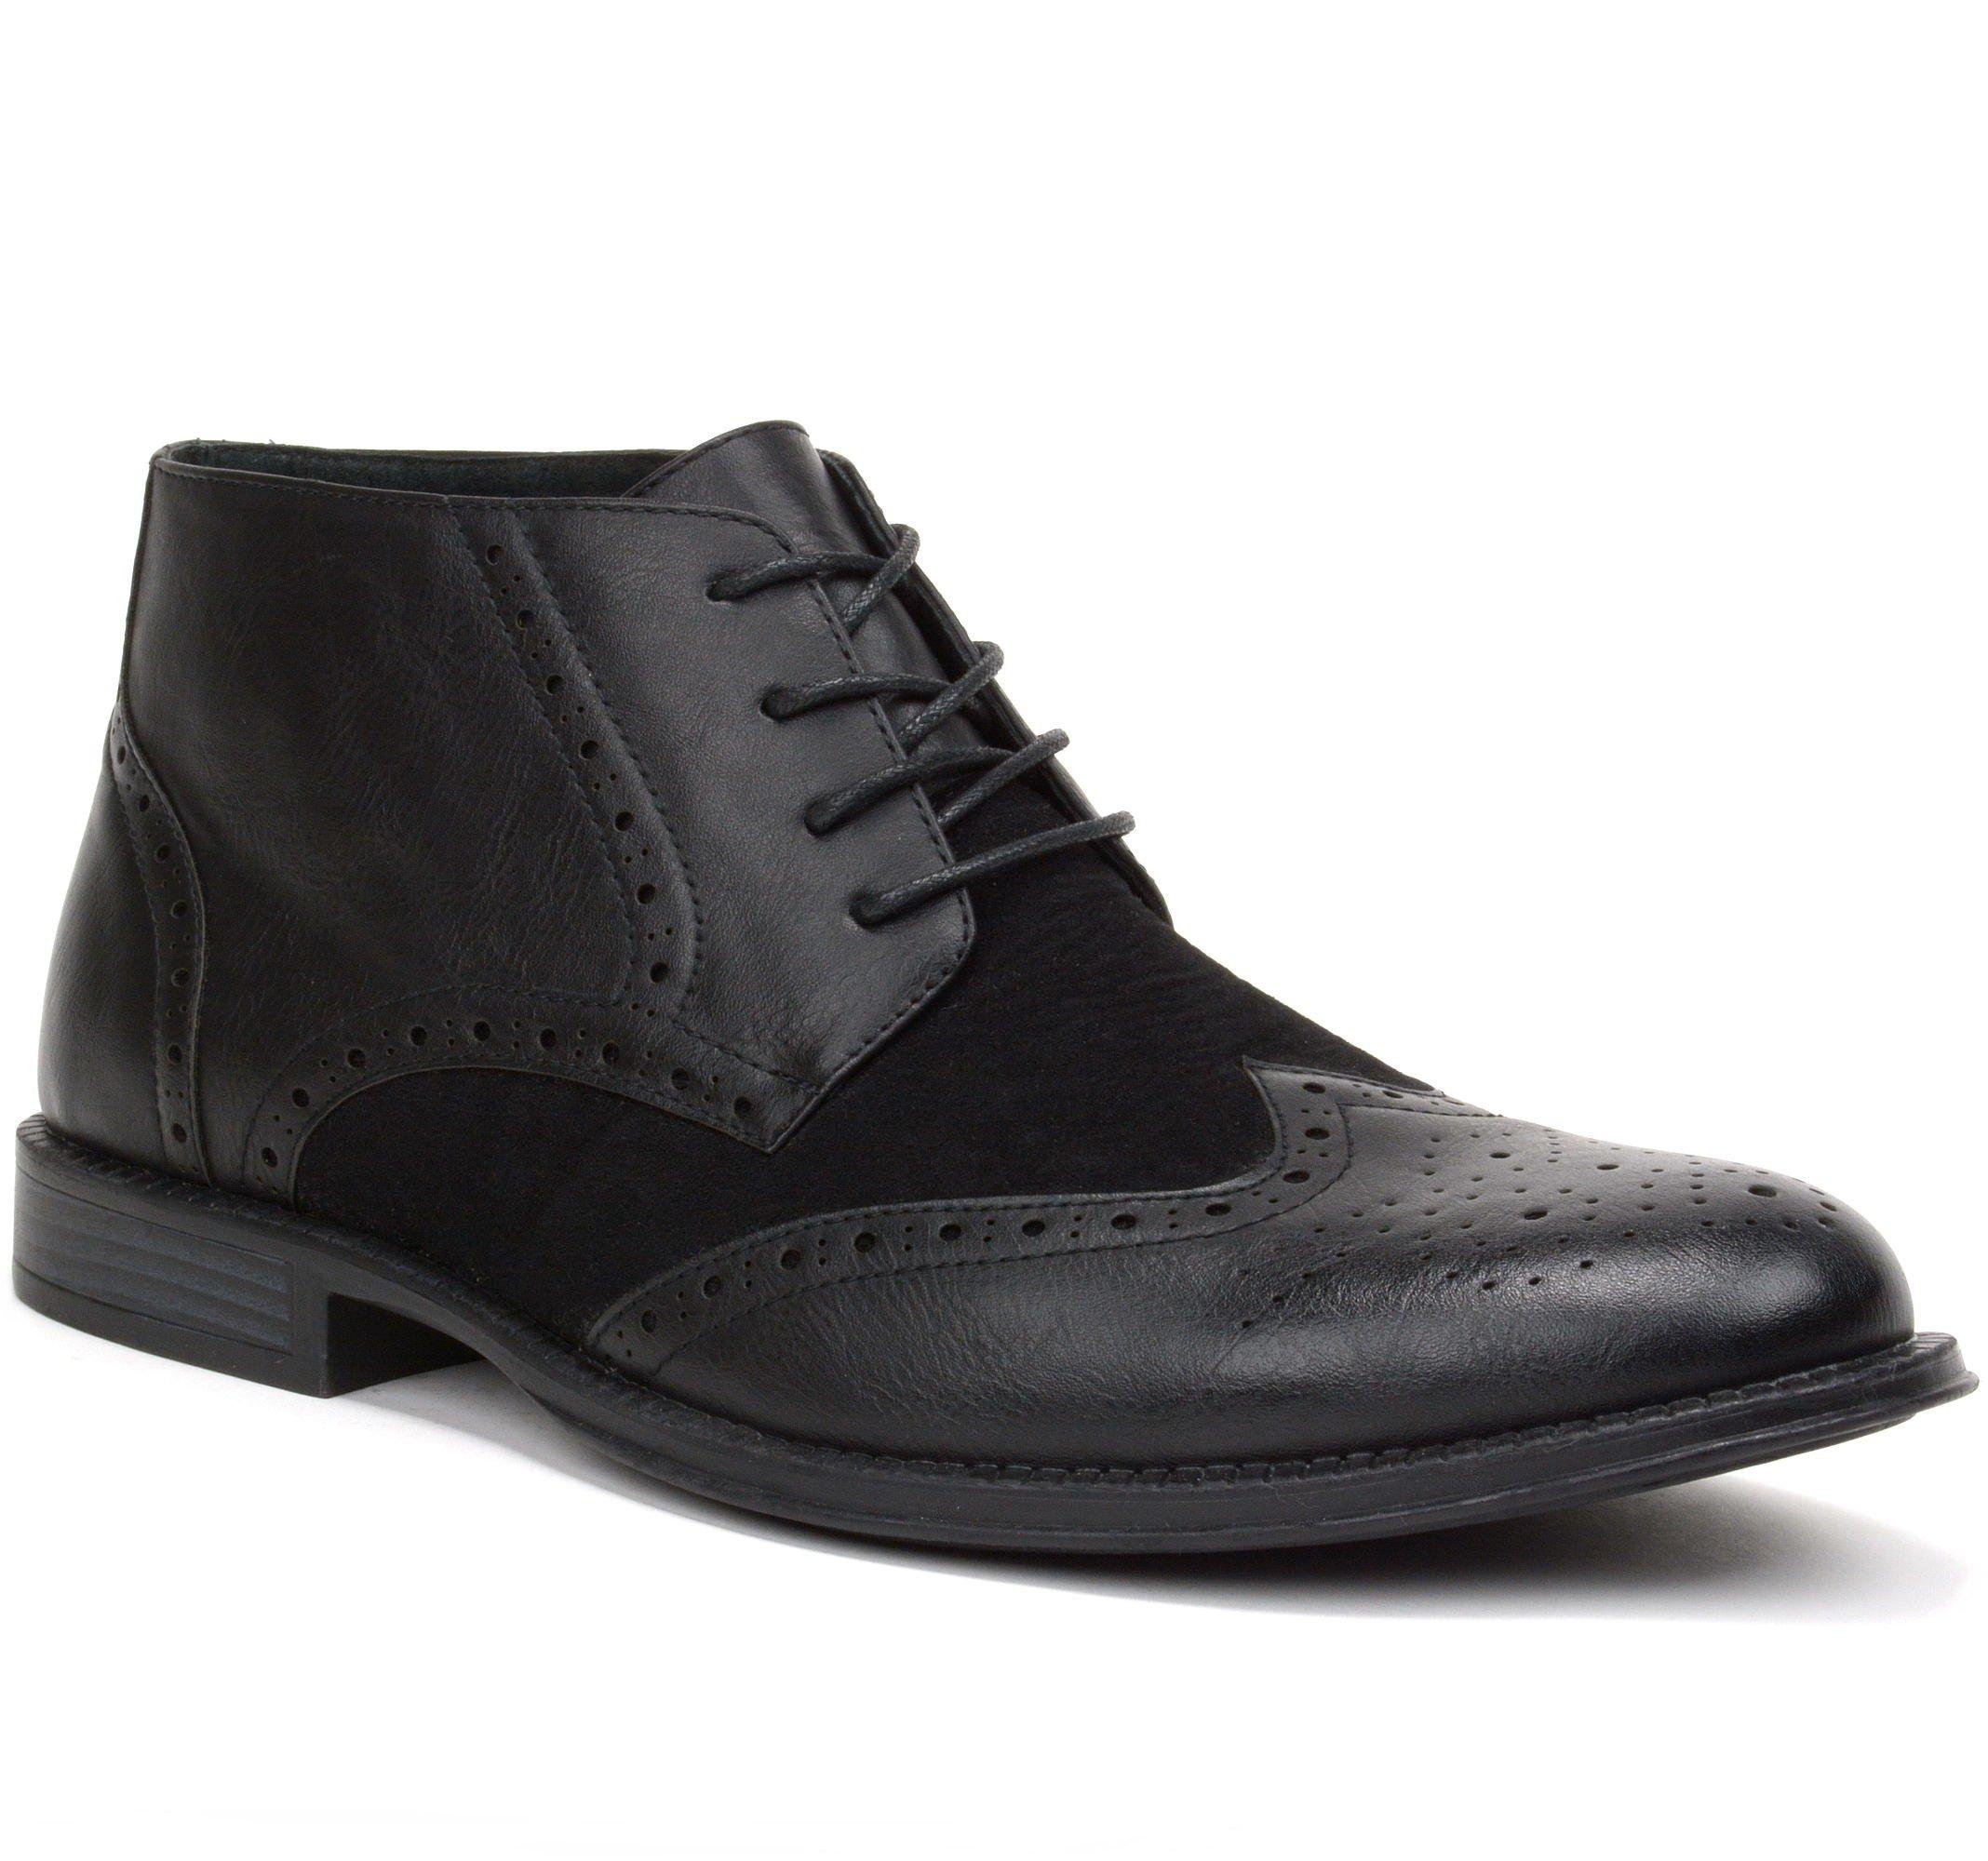 alpine swiss Geneva Men's Ankle Boots Brogue Wing Tip Dress Shoes Black 11 M US